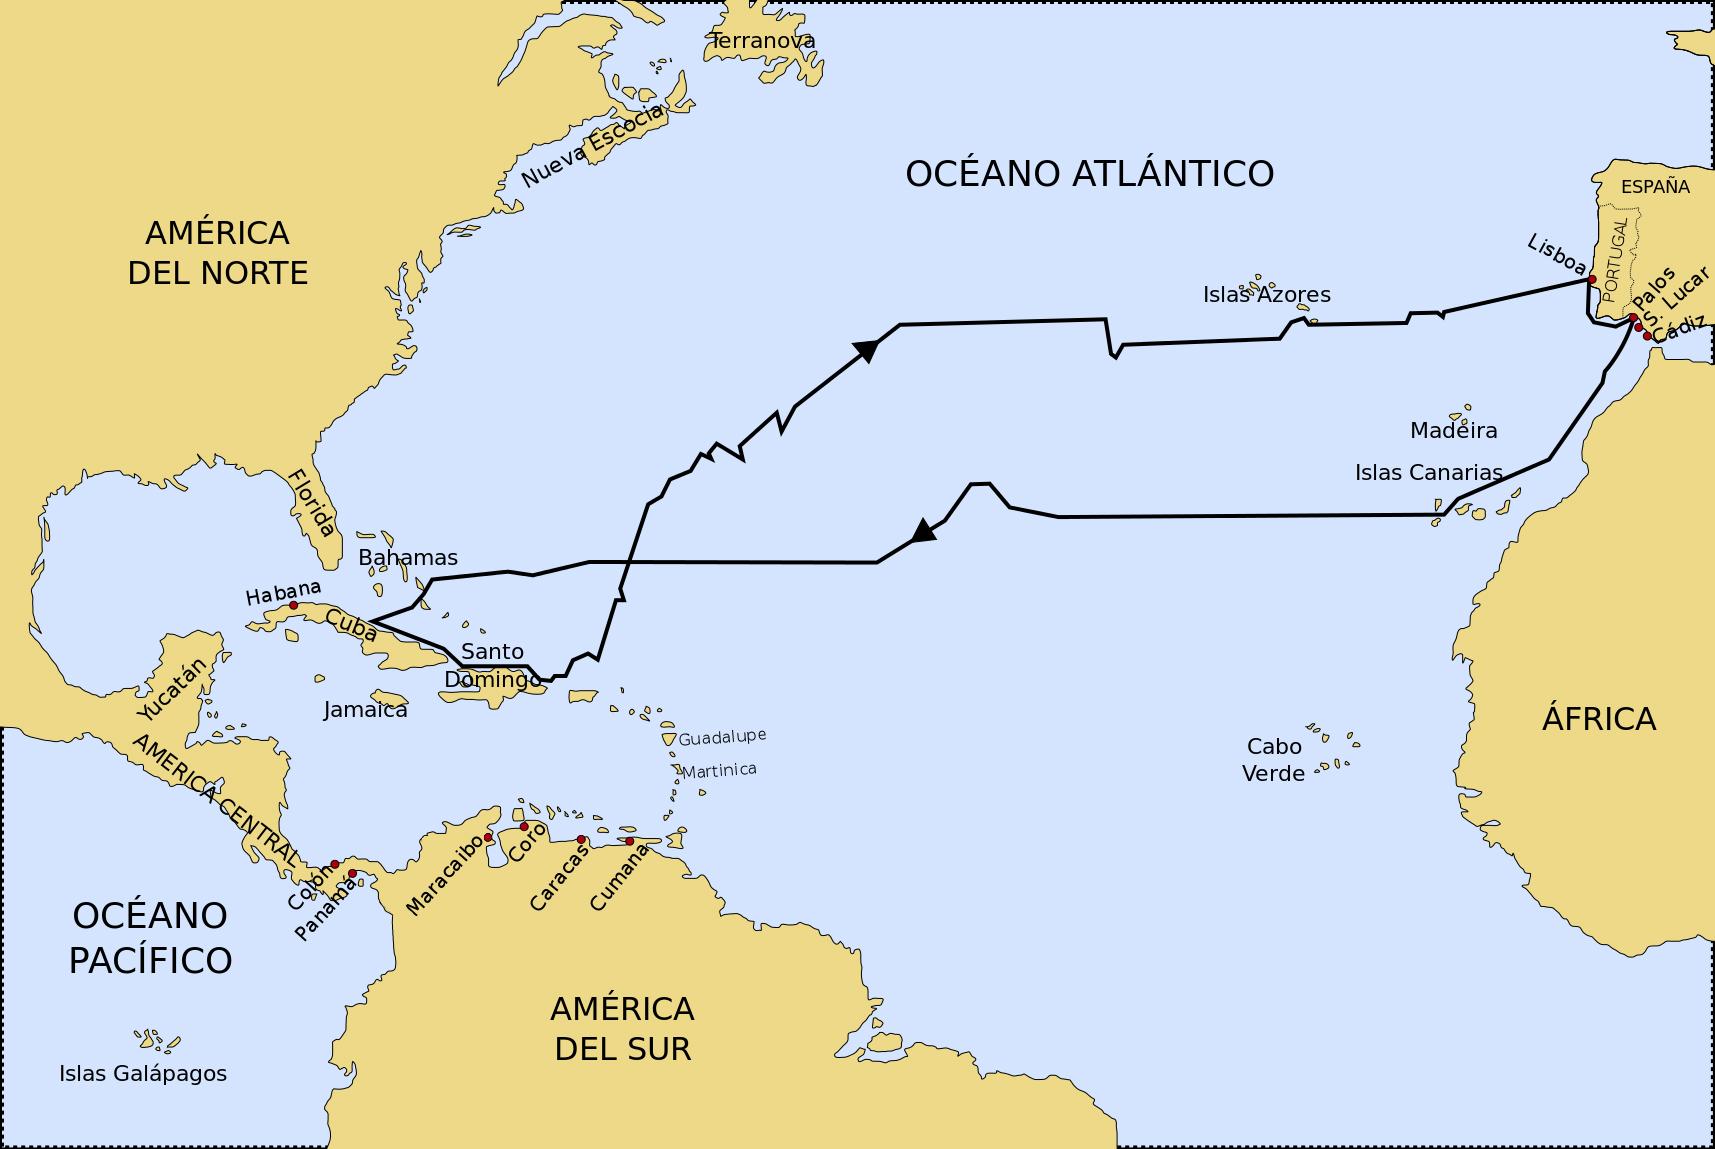 File primer viaje de col n 2 jpg wikimedia commons for Cuarto viaje de cristobal colon